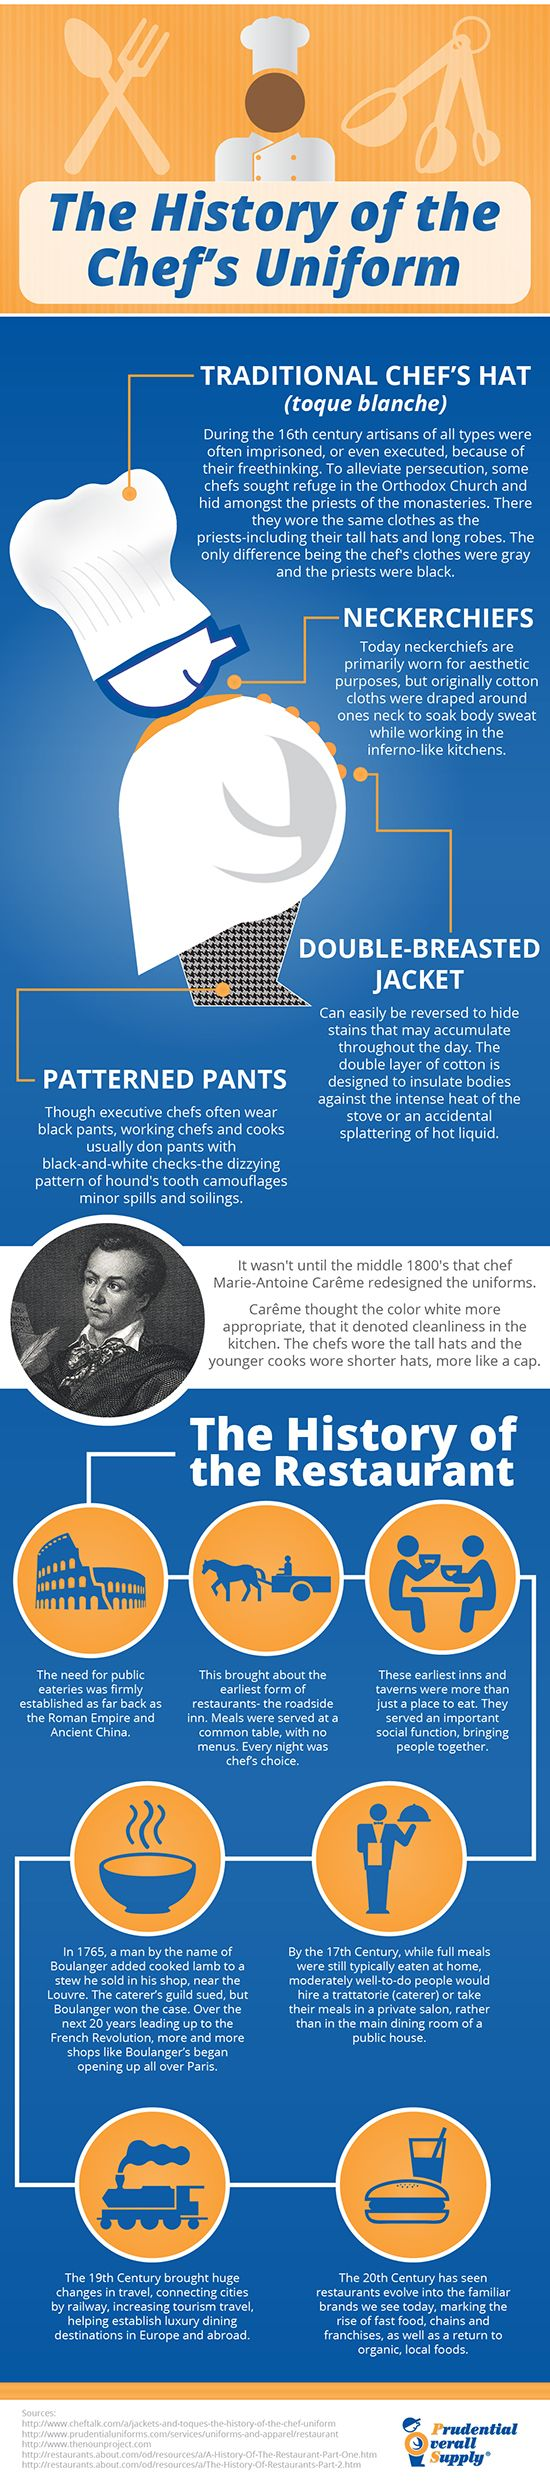 White apron chef fresno - The History Of The Chef S Uniform